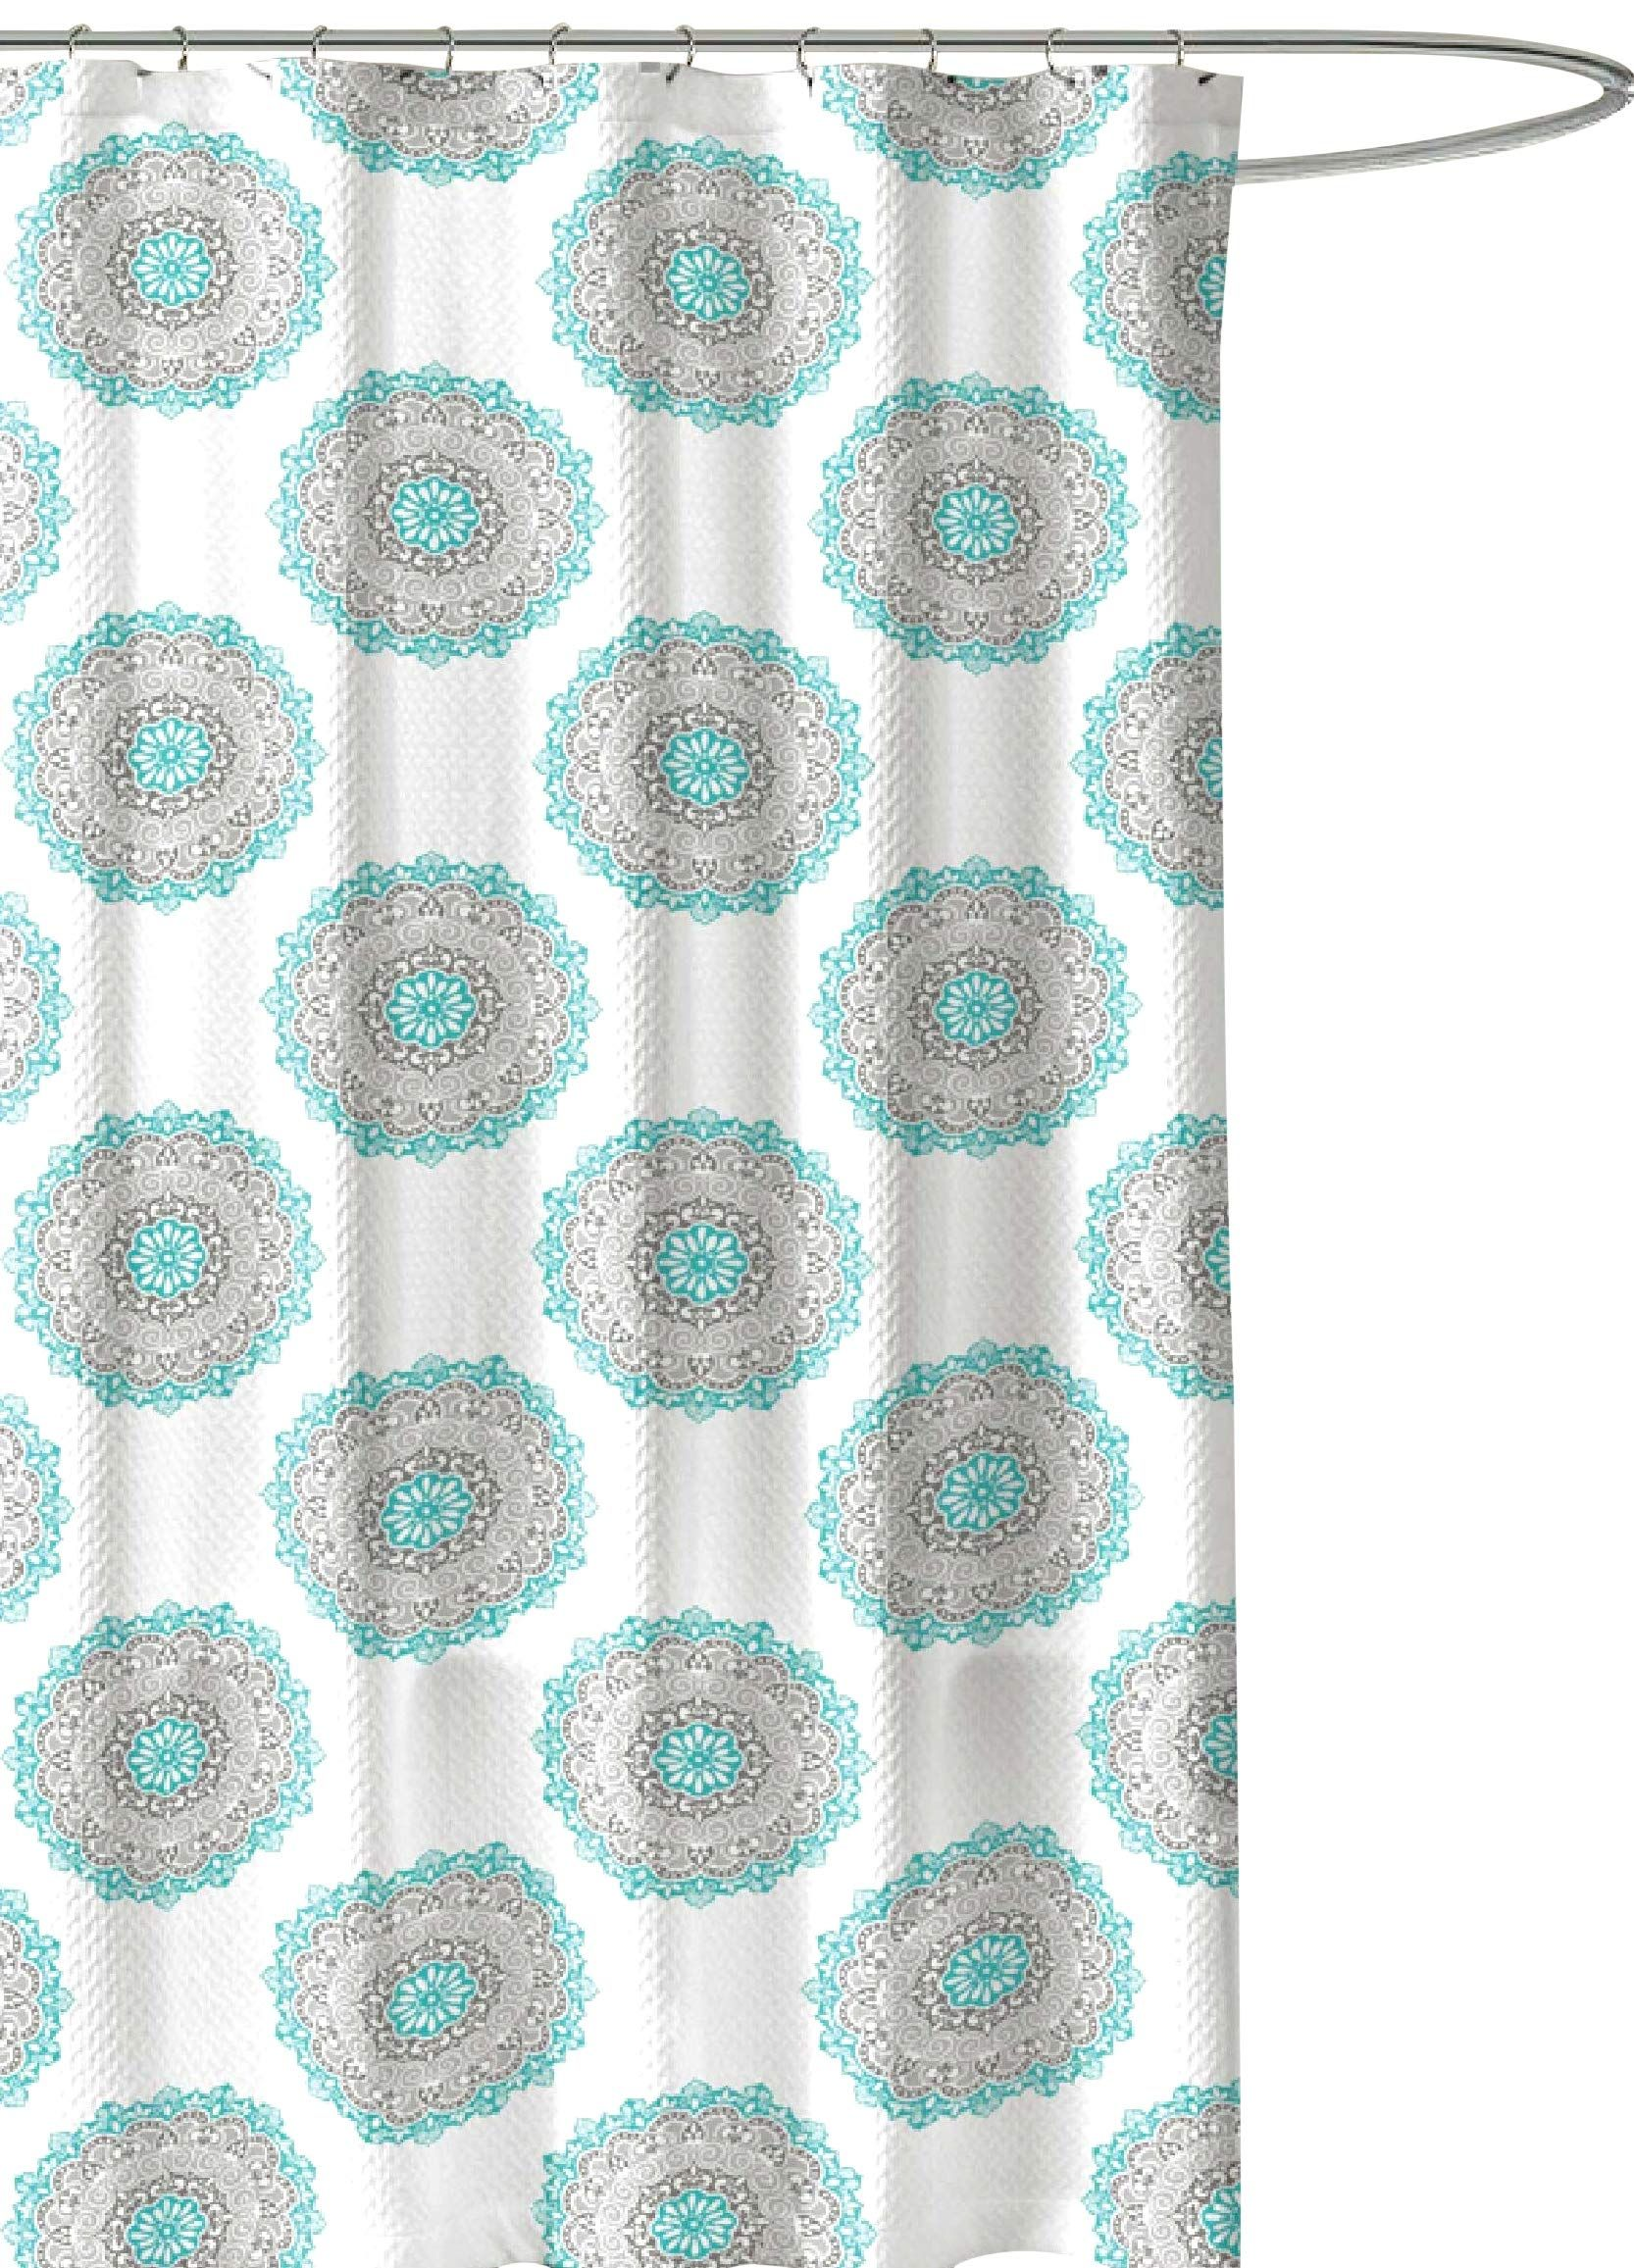 Turquoise Green Grey Fabric Shower Curtain Ornate Mandala Circle Design